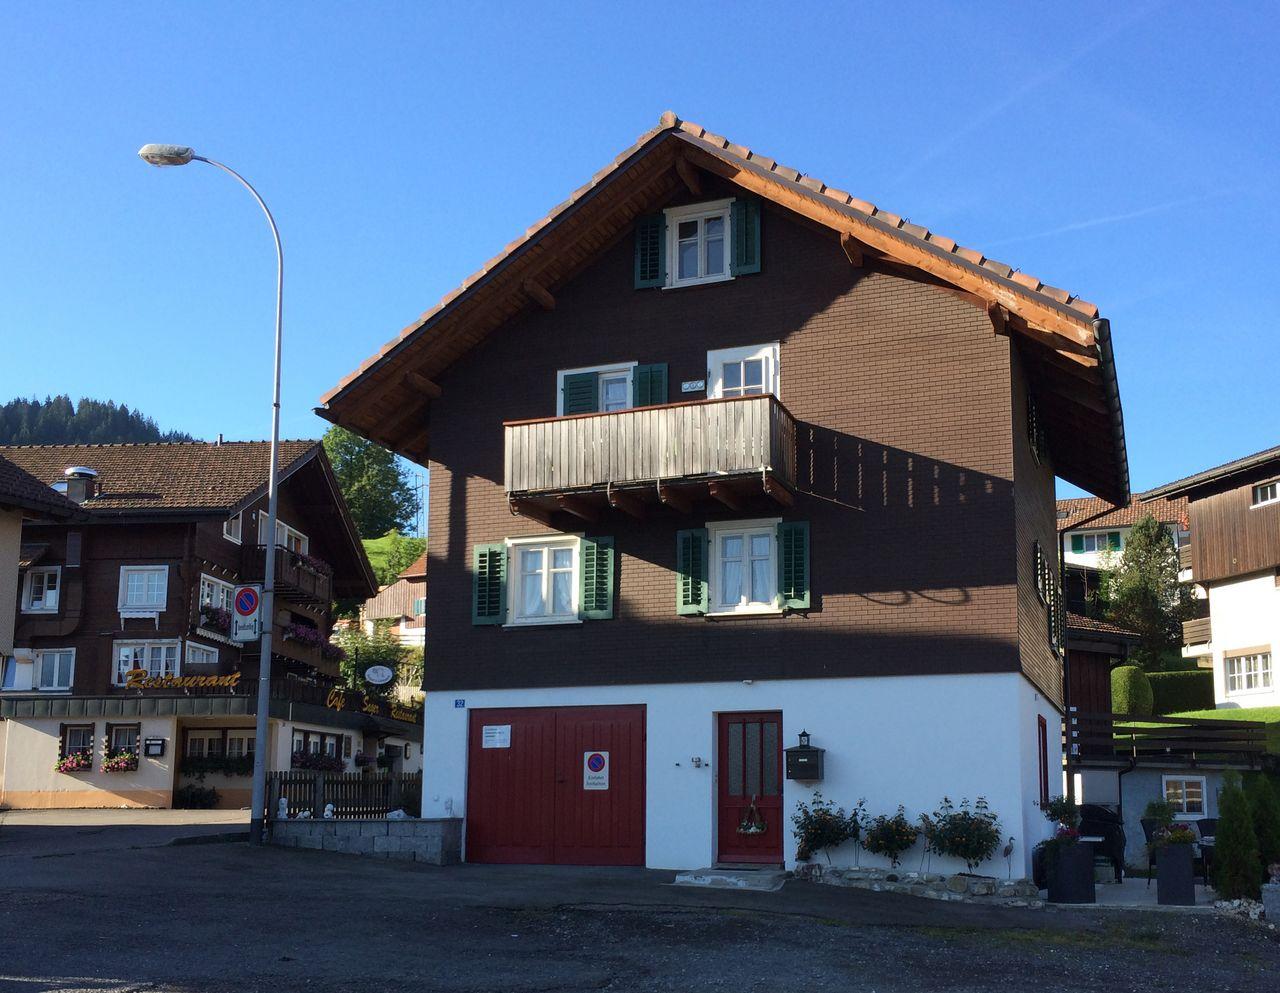 Tschalun, Marty - Oberiberg, Ybrig